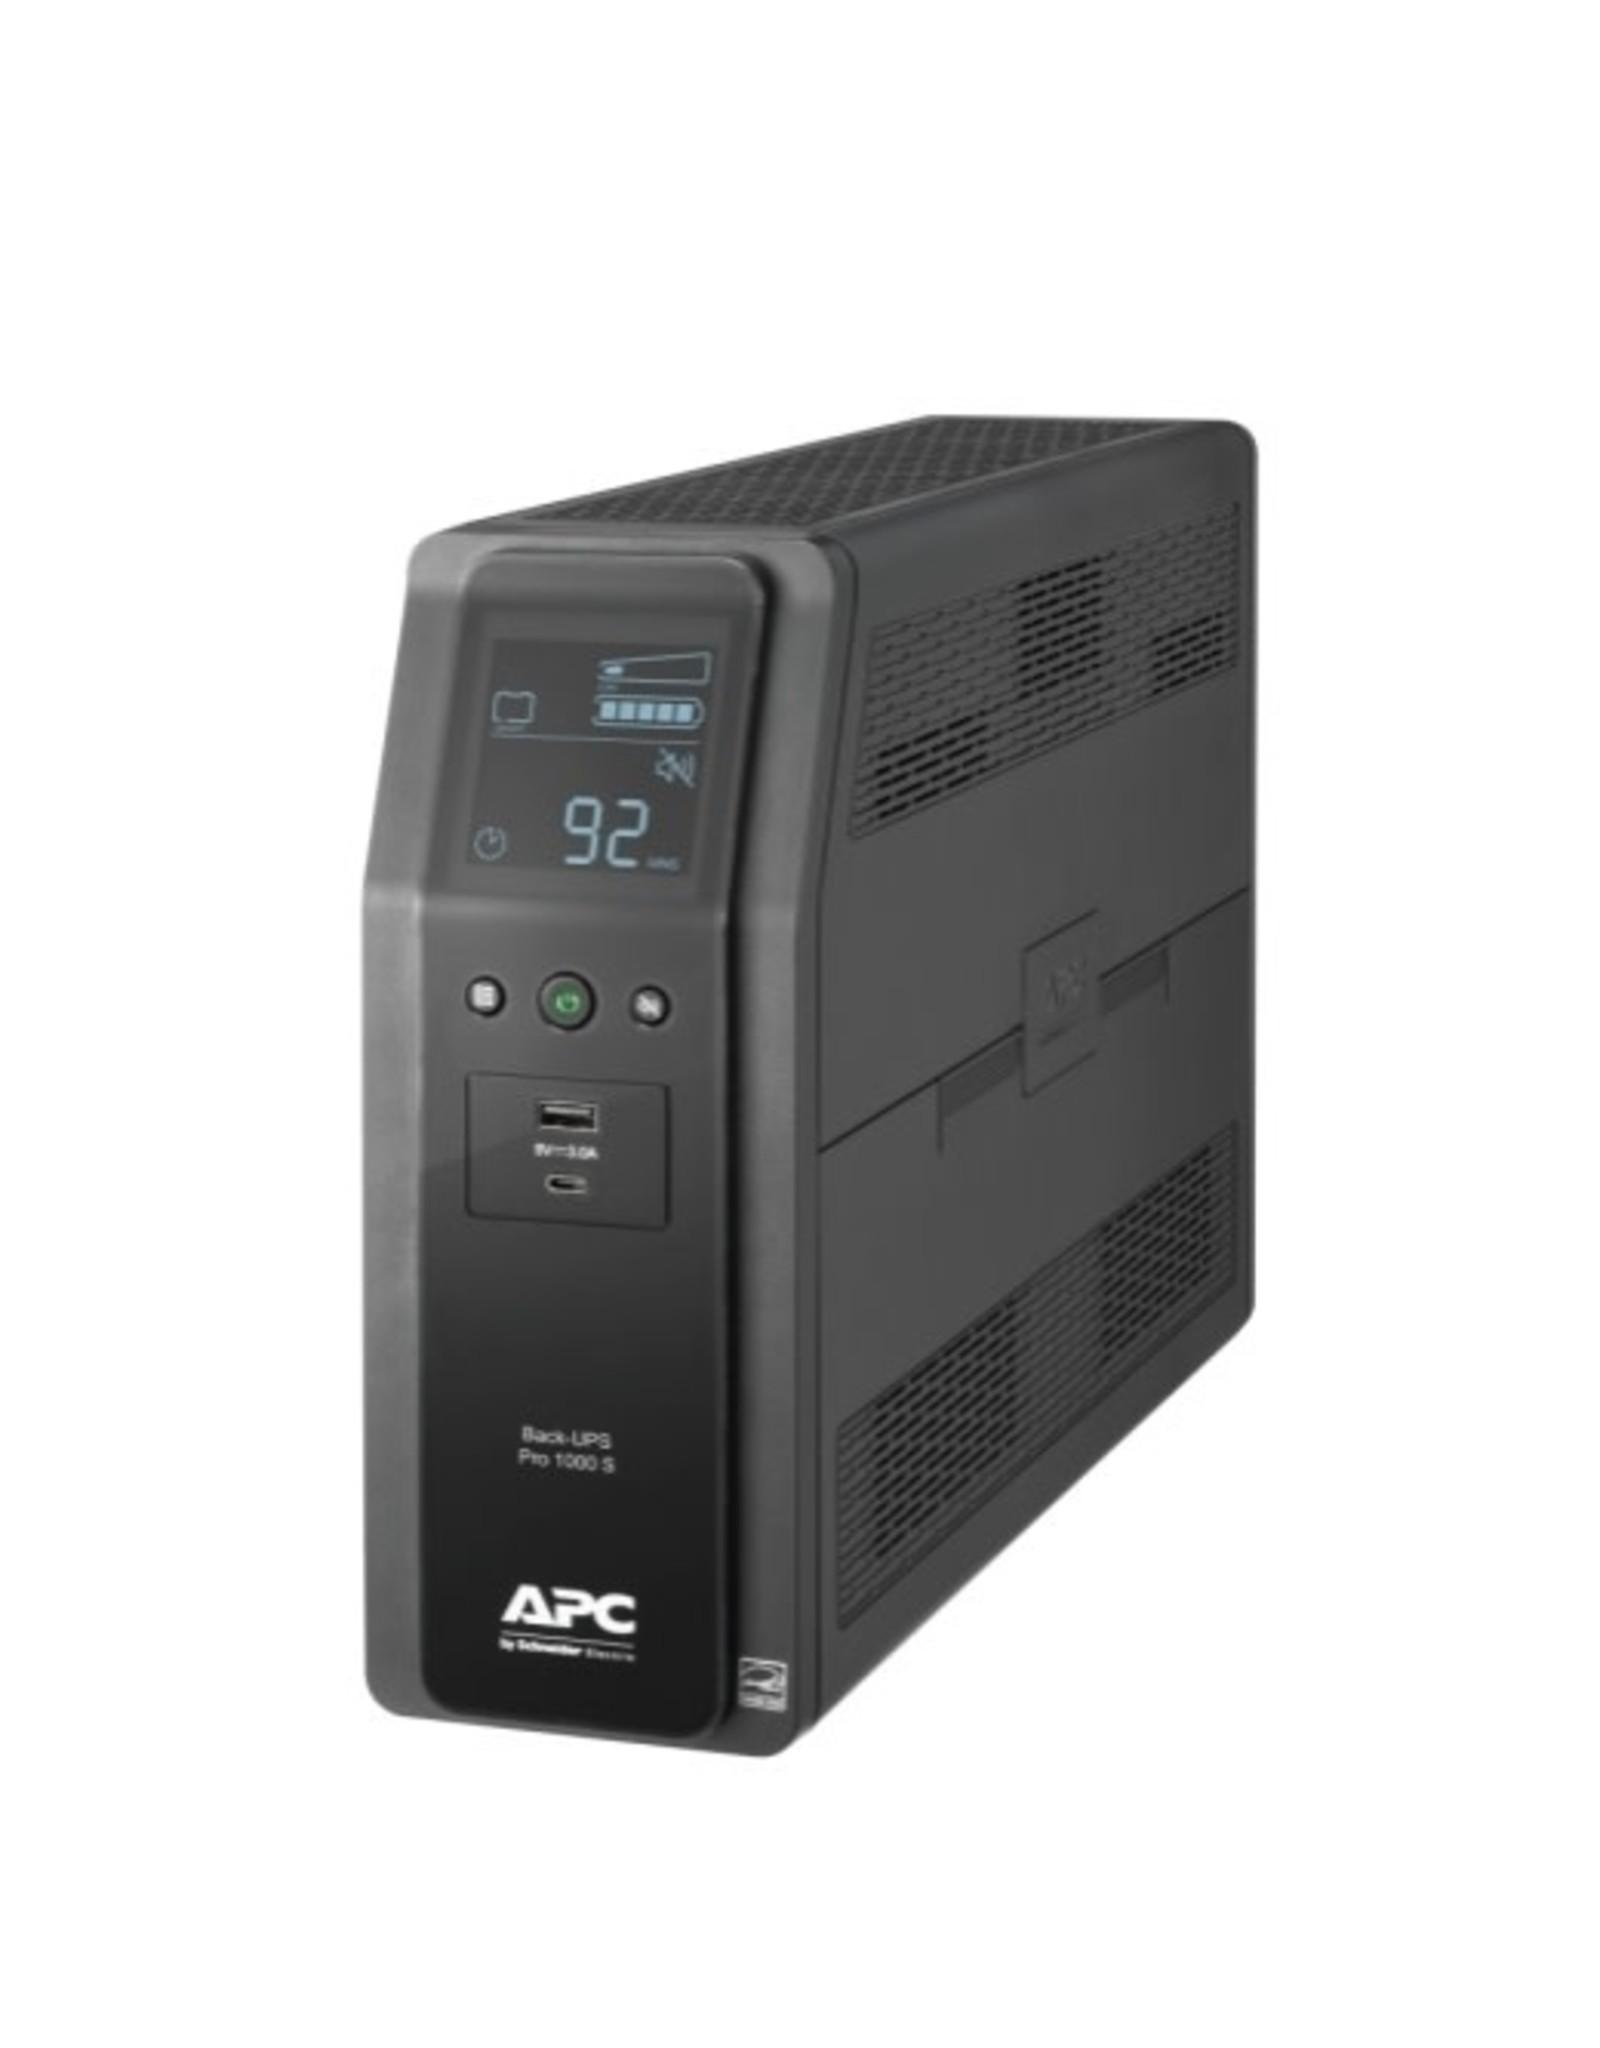 APC APC Back-UPS PRO BR 1000VA, SineWave, 10 Outlets, 2 USB Charging Ports, AVR, LCD interface